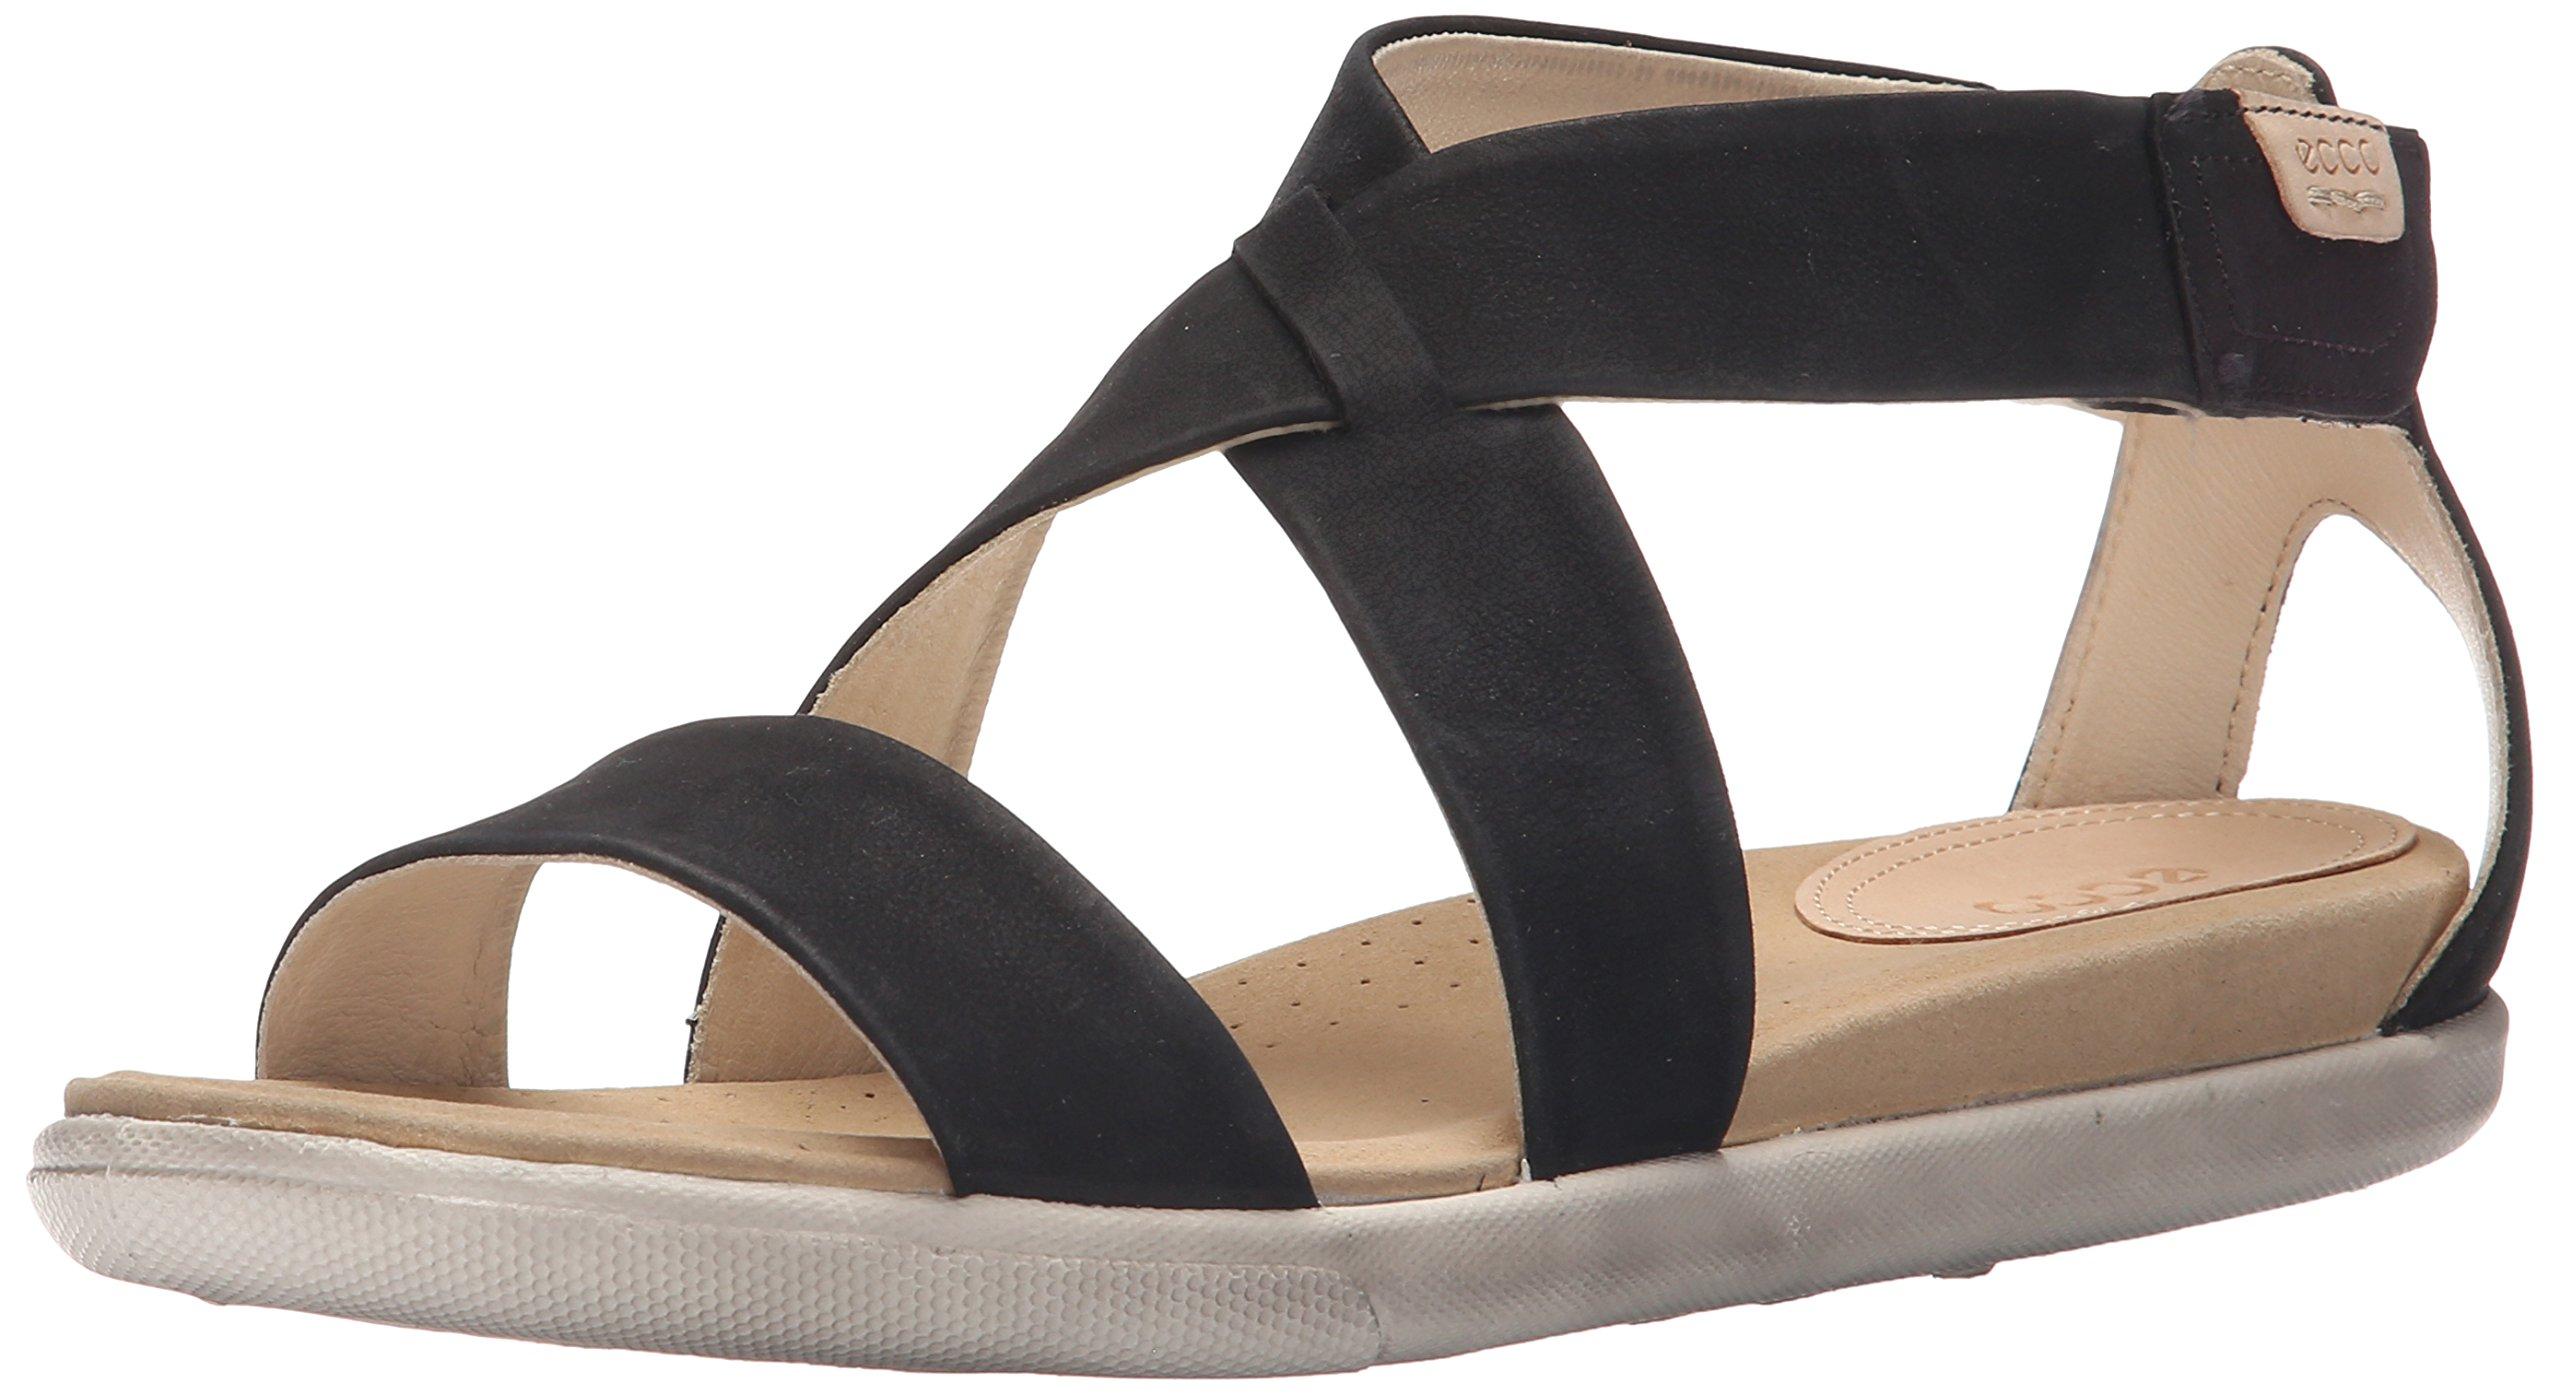 Ecco Footwear Womens Damara Strap Gladiator Sandal, Black, 40 EU/9-9.5 M US